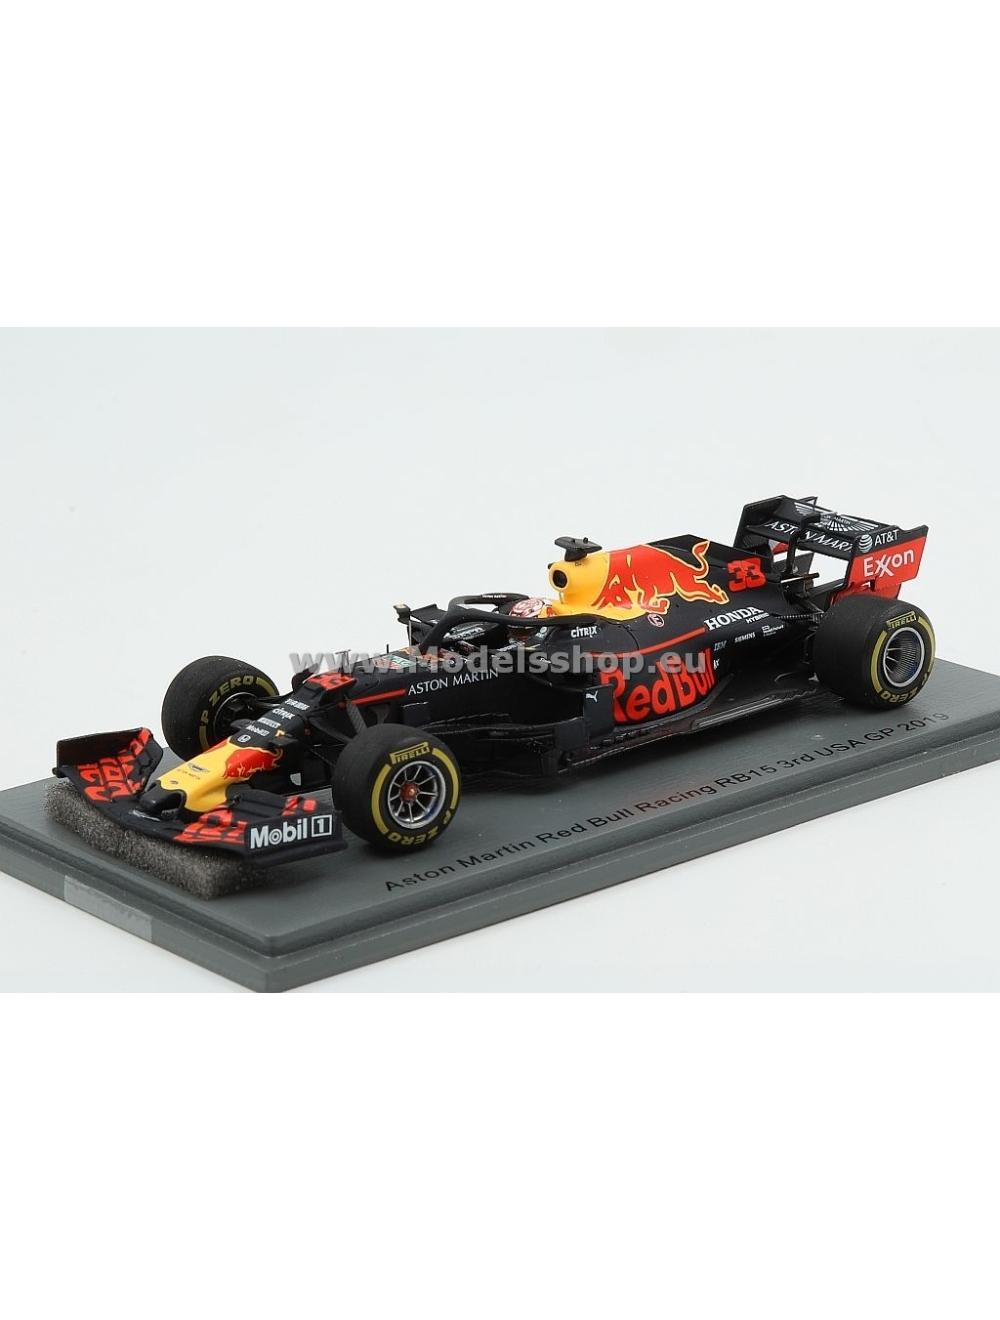 Aston Martin Red Bull Racing F1 Team No 33 3rd Usa Gp2019 Formula One 100th Gp